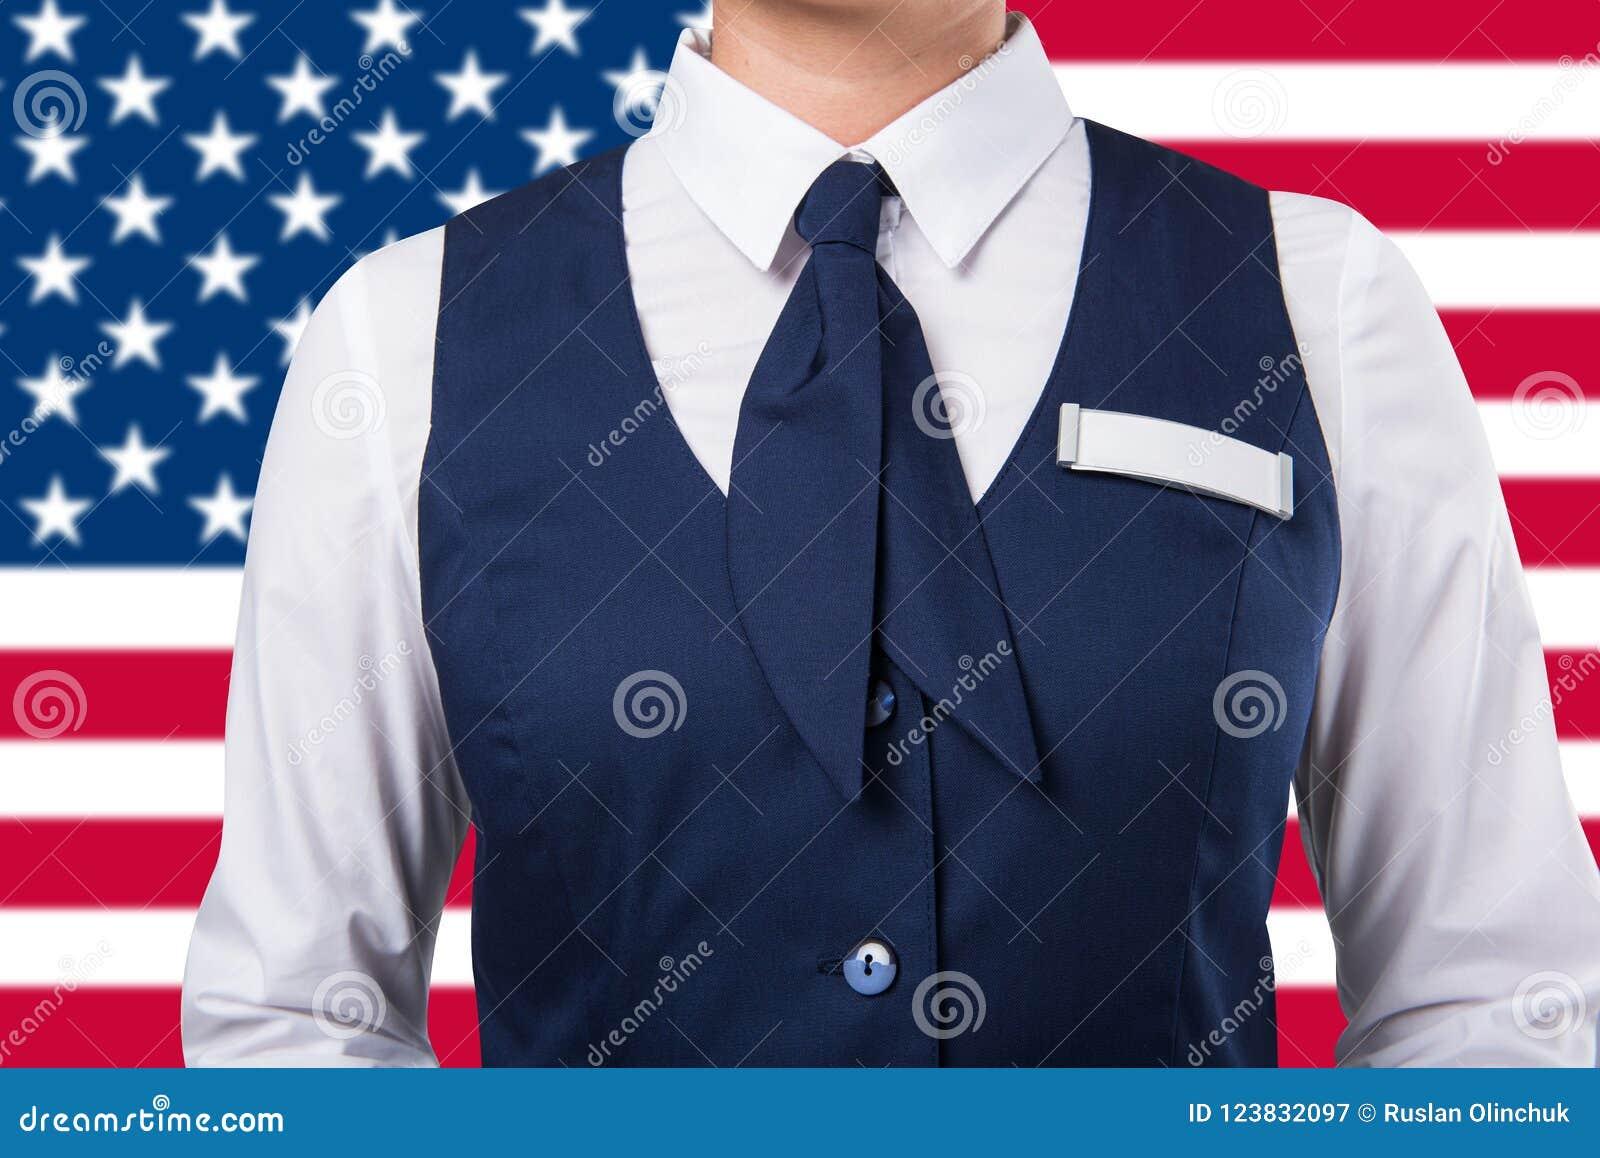 Service Woman Uniform Stock Image Image Of Hostess 123832097